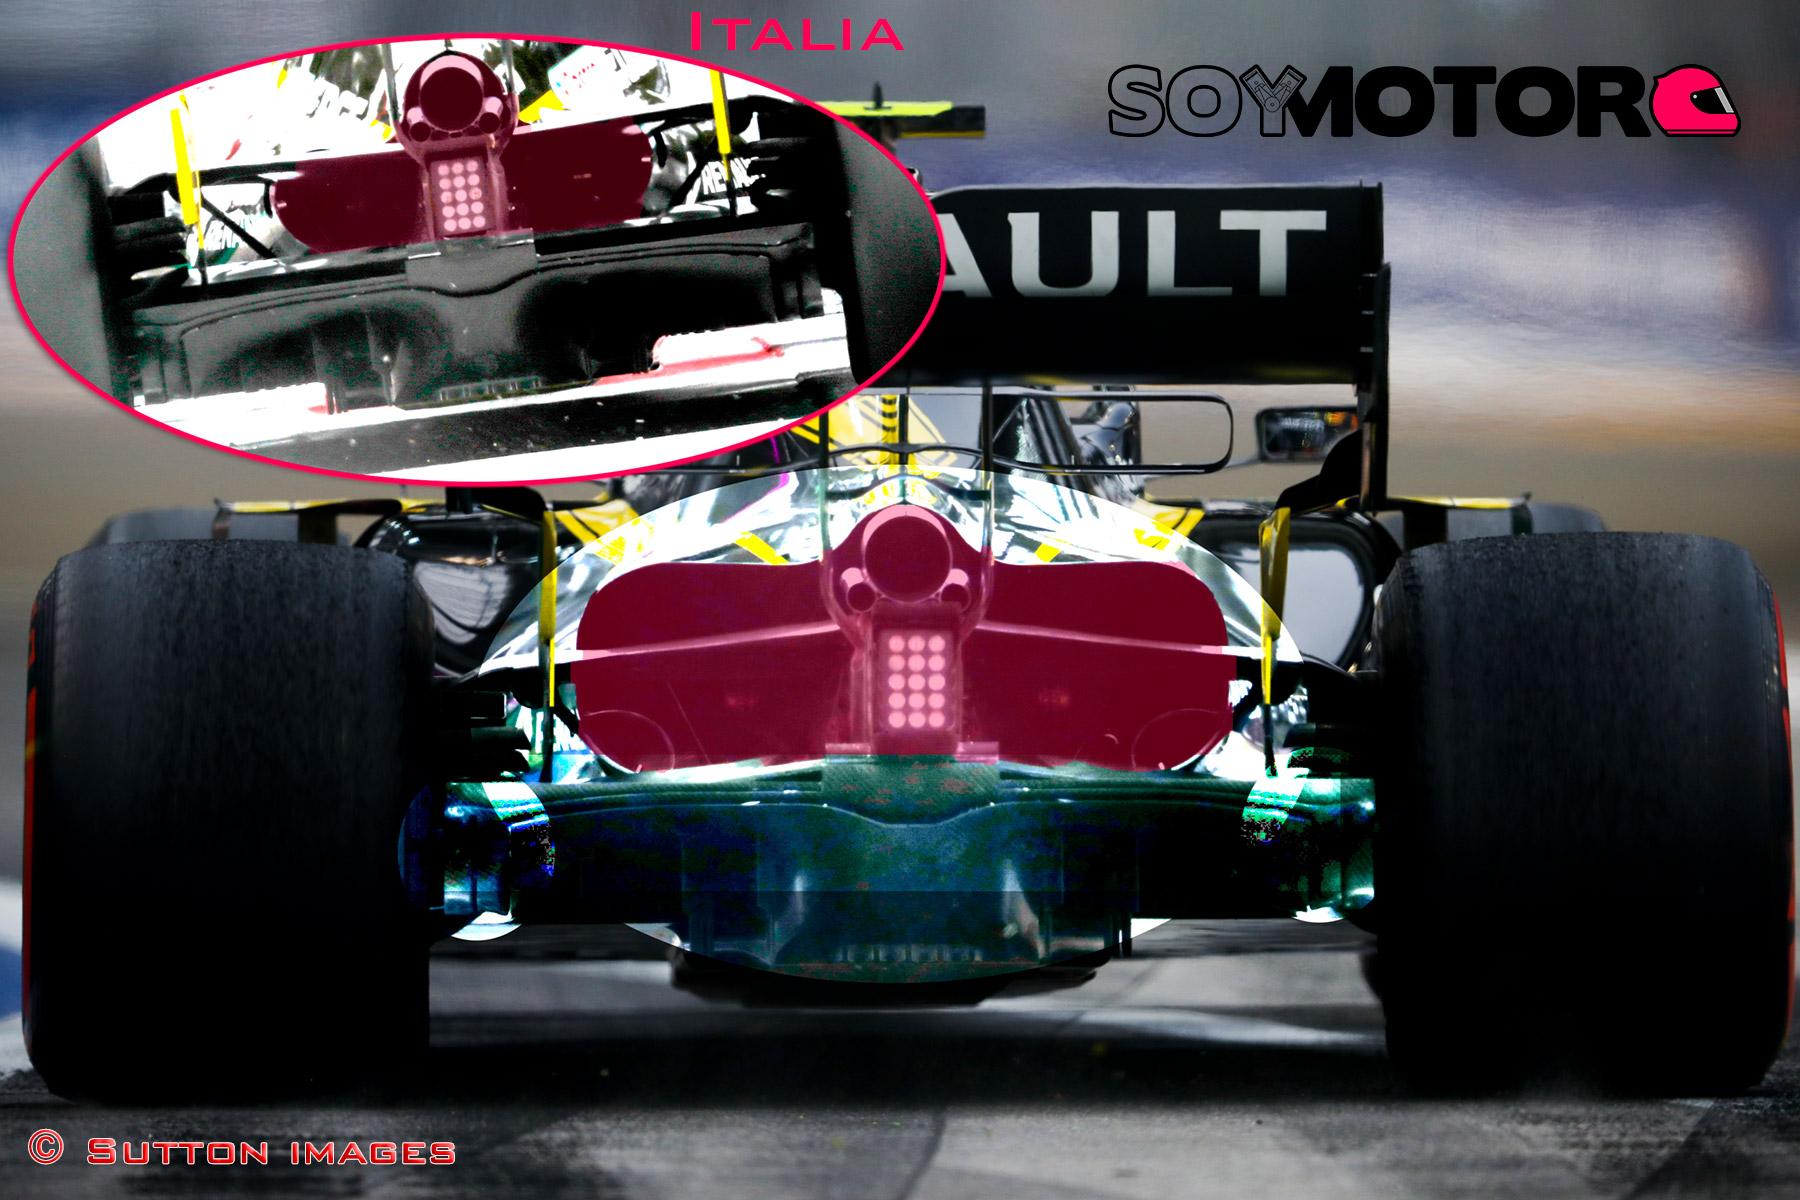 renault-salida-posterior-soymotor.jpg